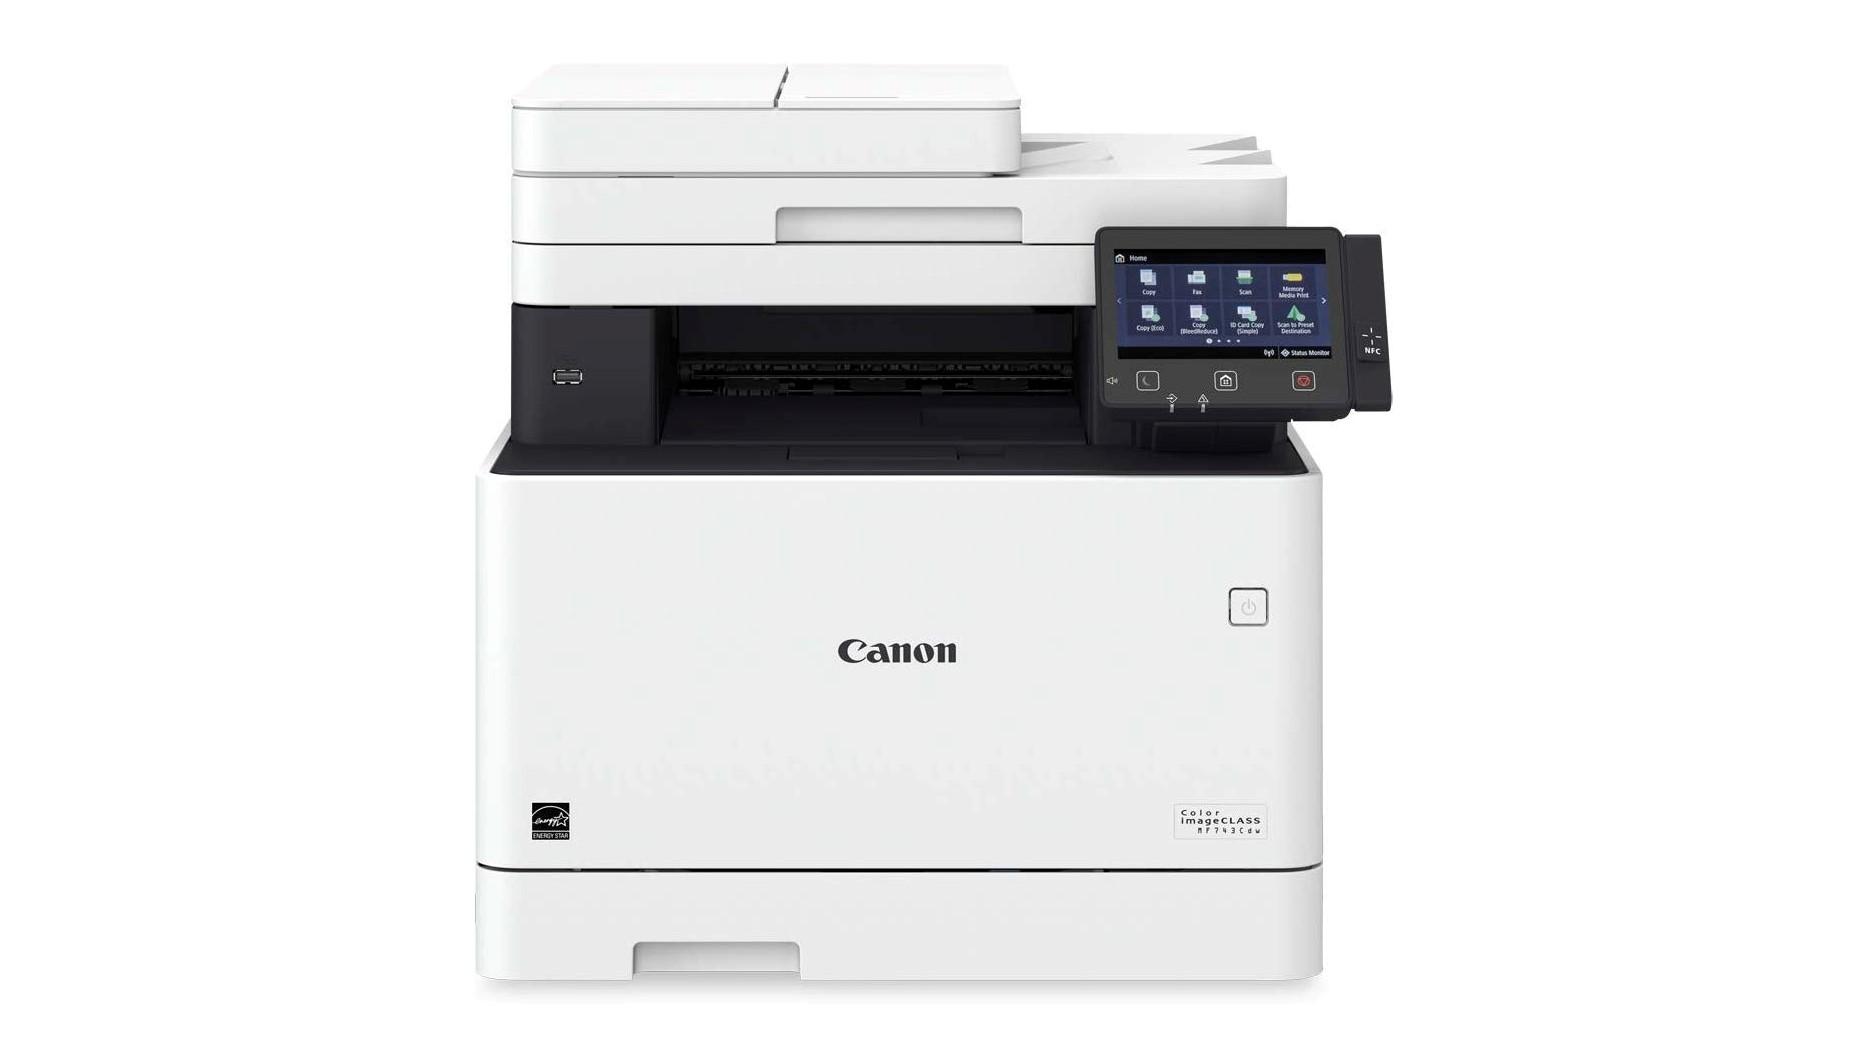 Canon ImageClass MF743Cdw printer